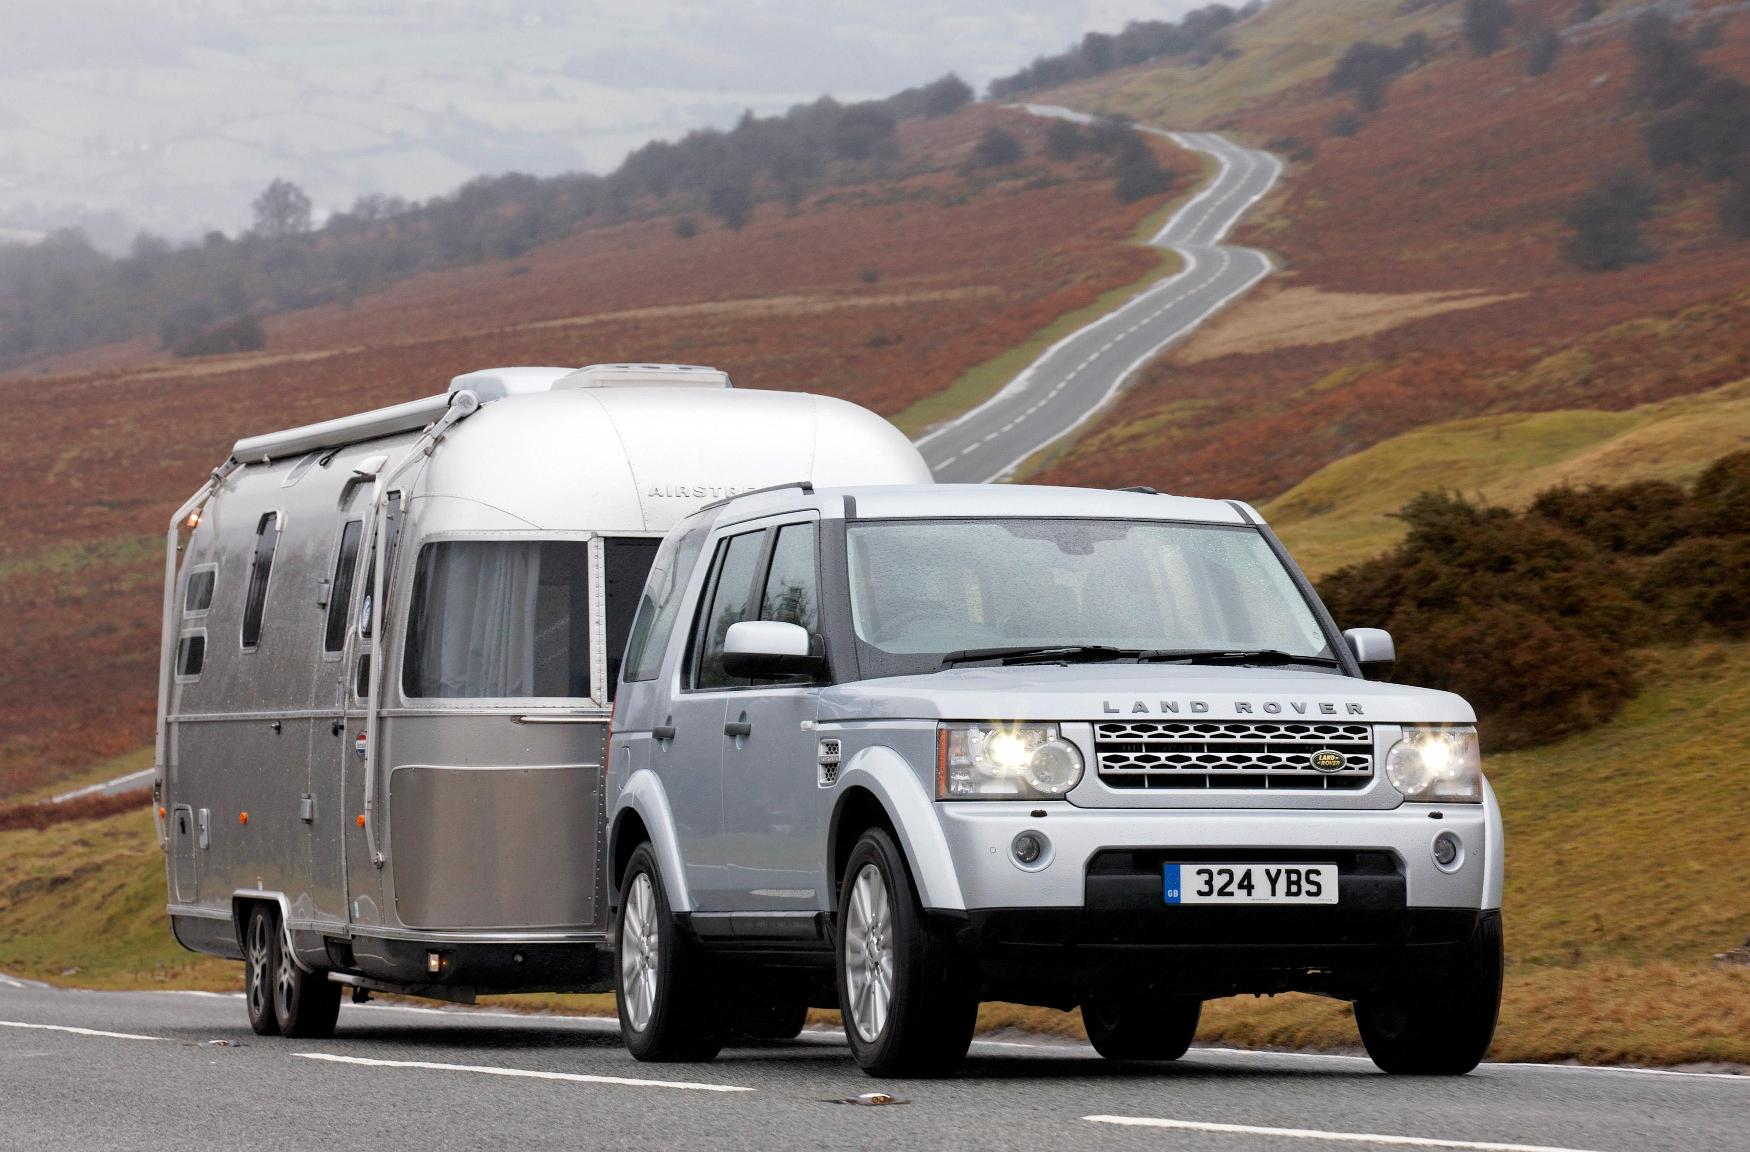 Lr 4 Wins Best Towcar In Caravan Owners Survey The Land